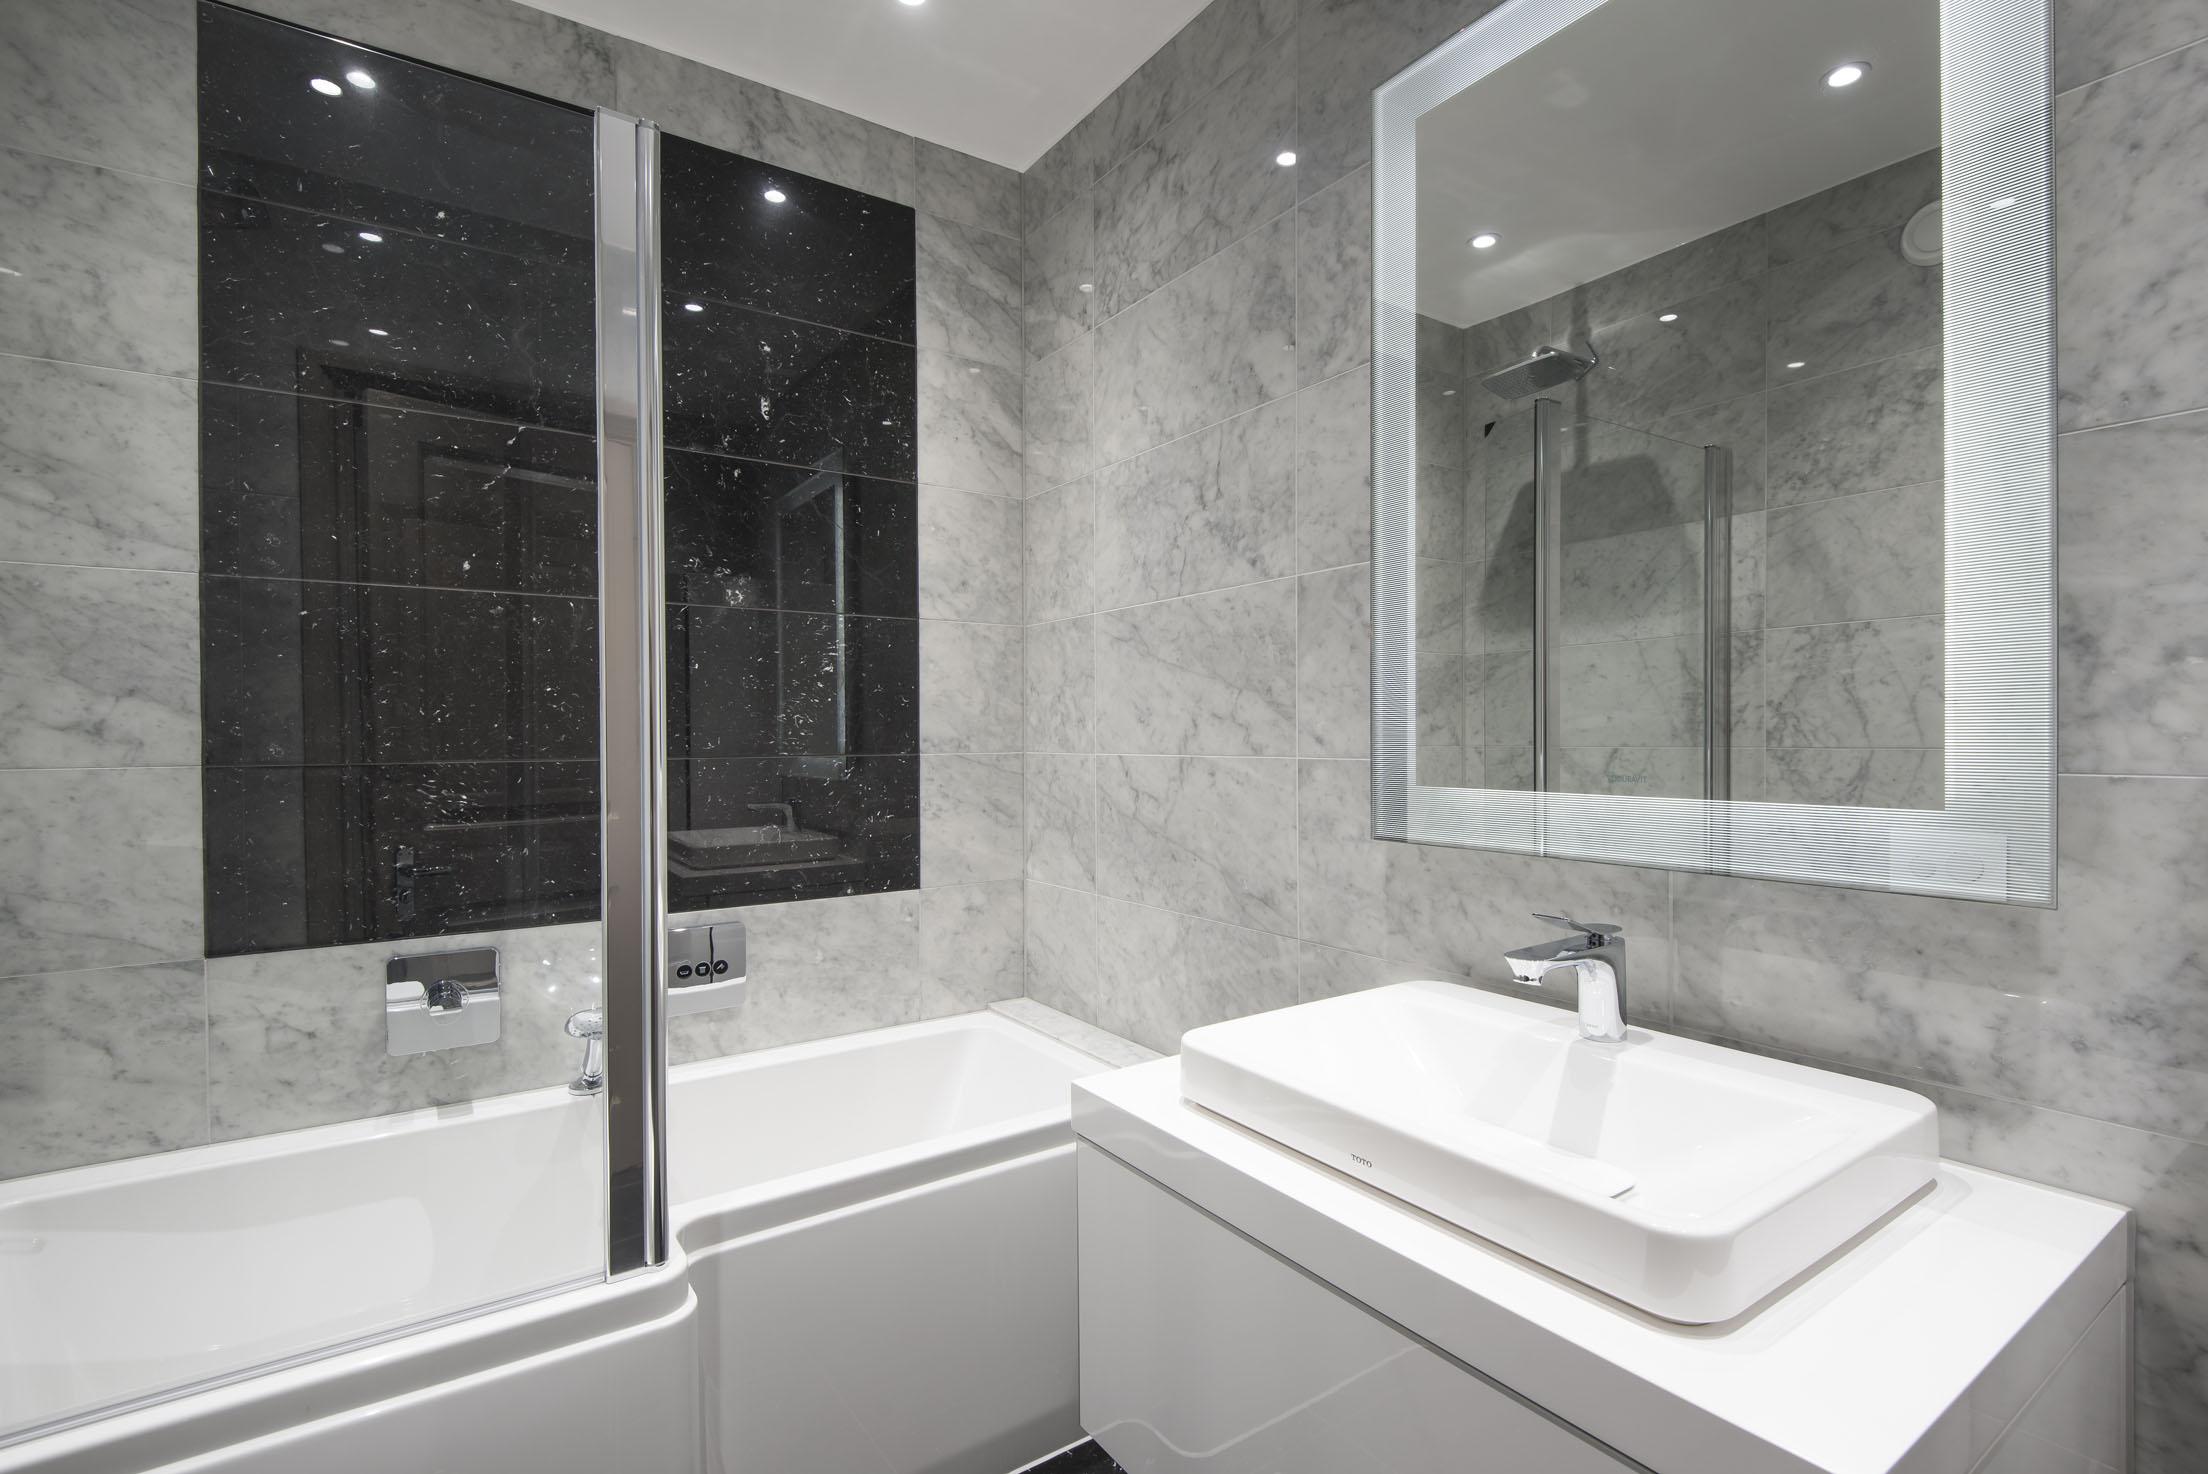 Mayfair bathrooms london projects kuche bagno